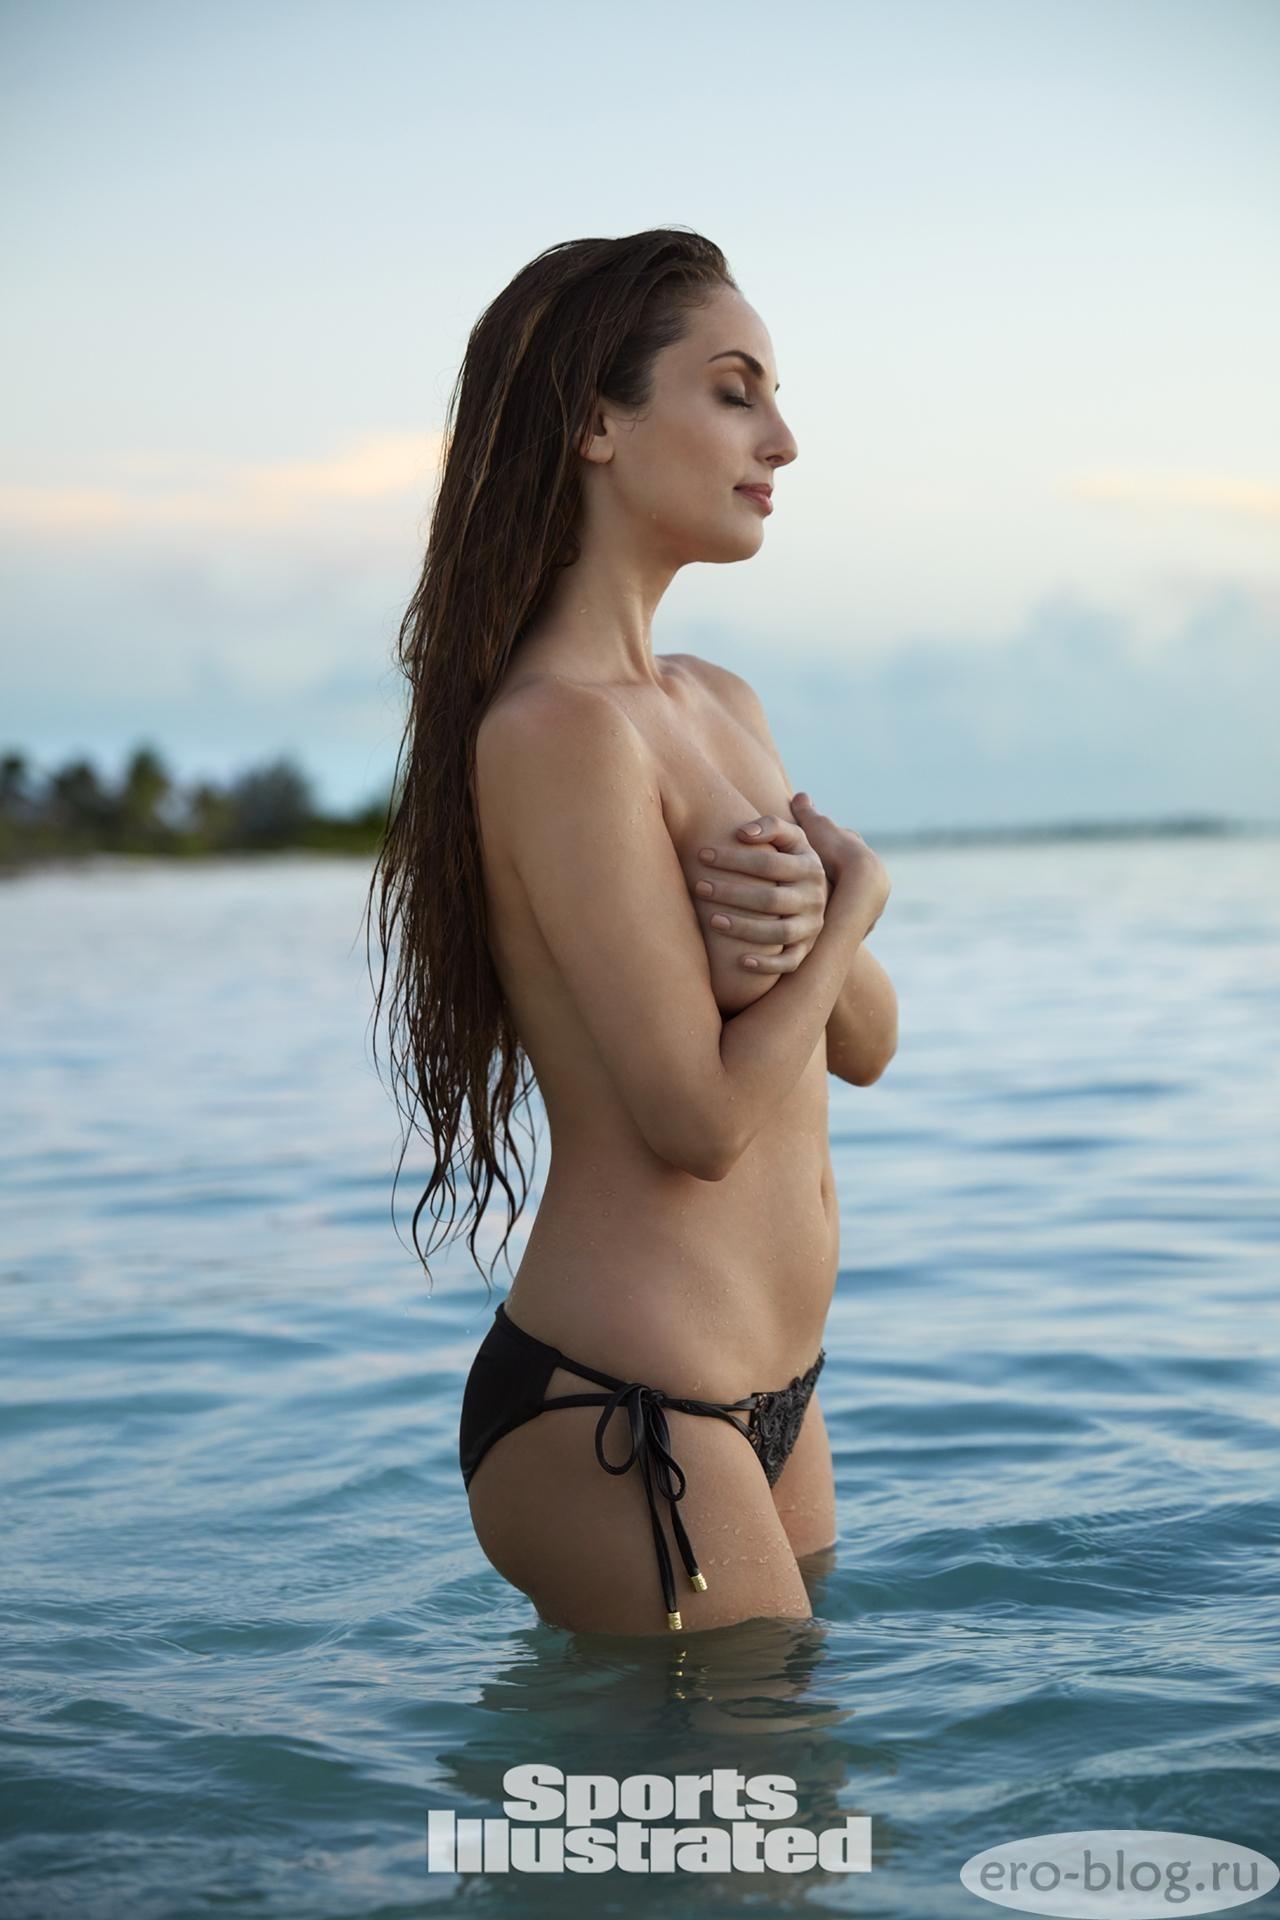 Голая обнаженная Alexa Ray Joel | Алекса Рэй Джоэл интимные фото звезды